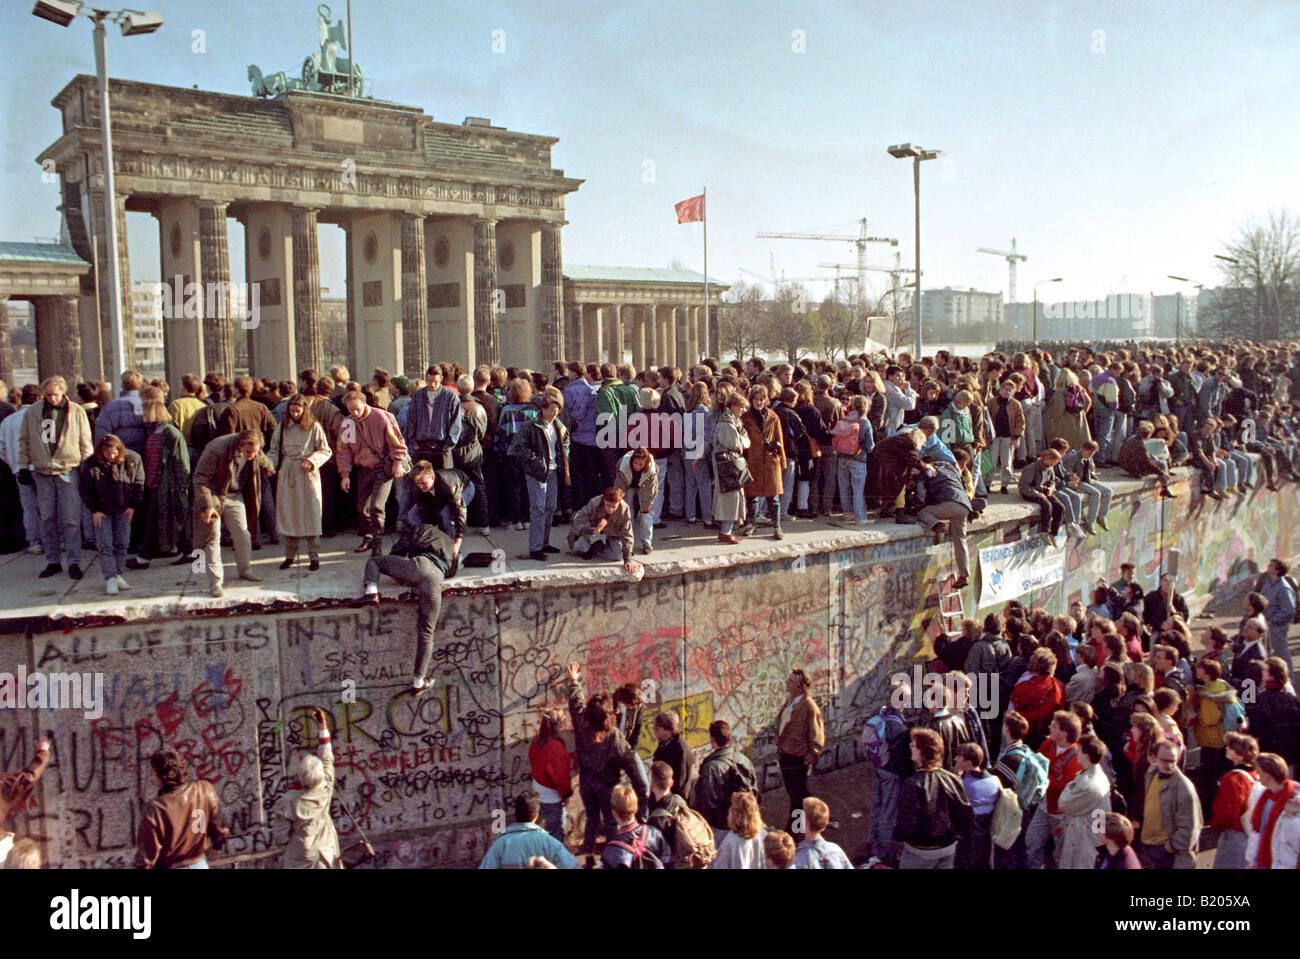 Fall der Berliner Mauer Stockbild